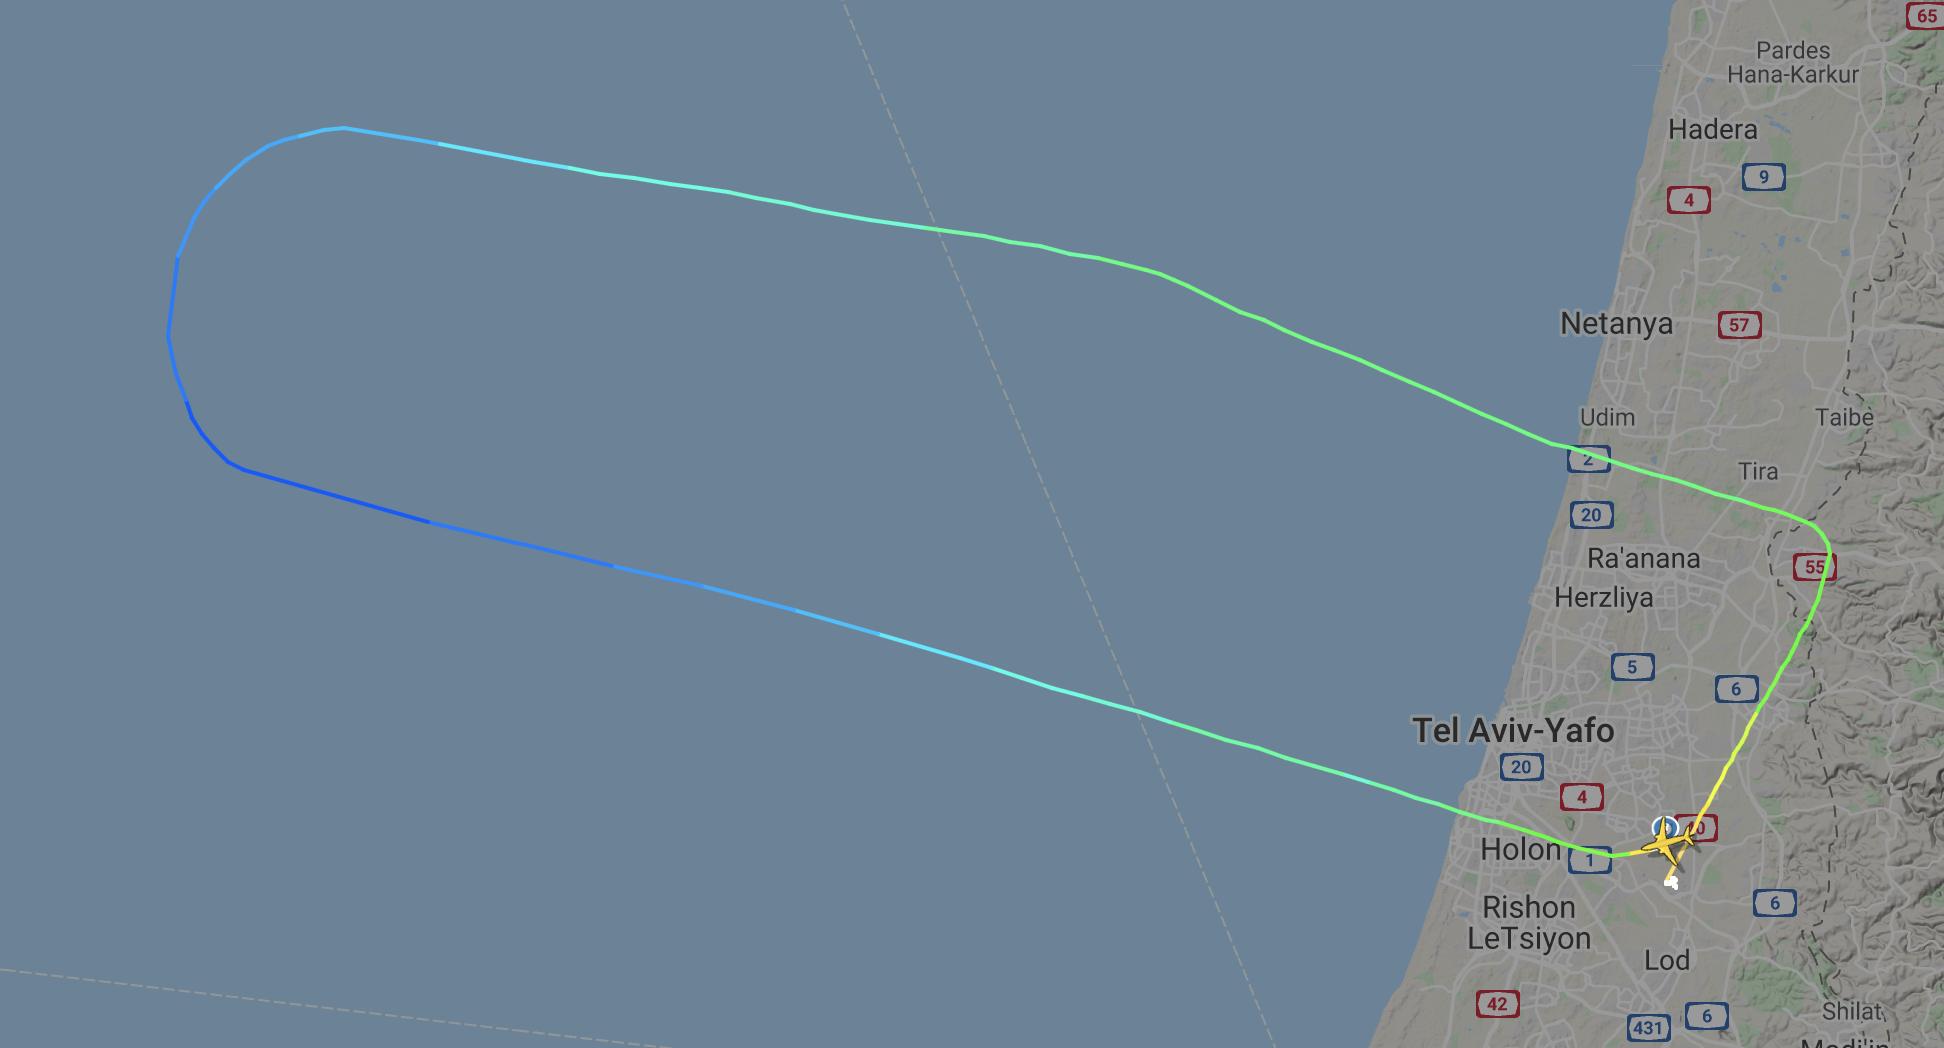 El Al Israel Tel Aviv test flight Abu Dhabi